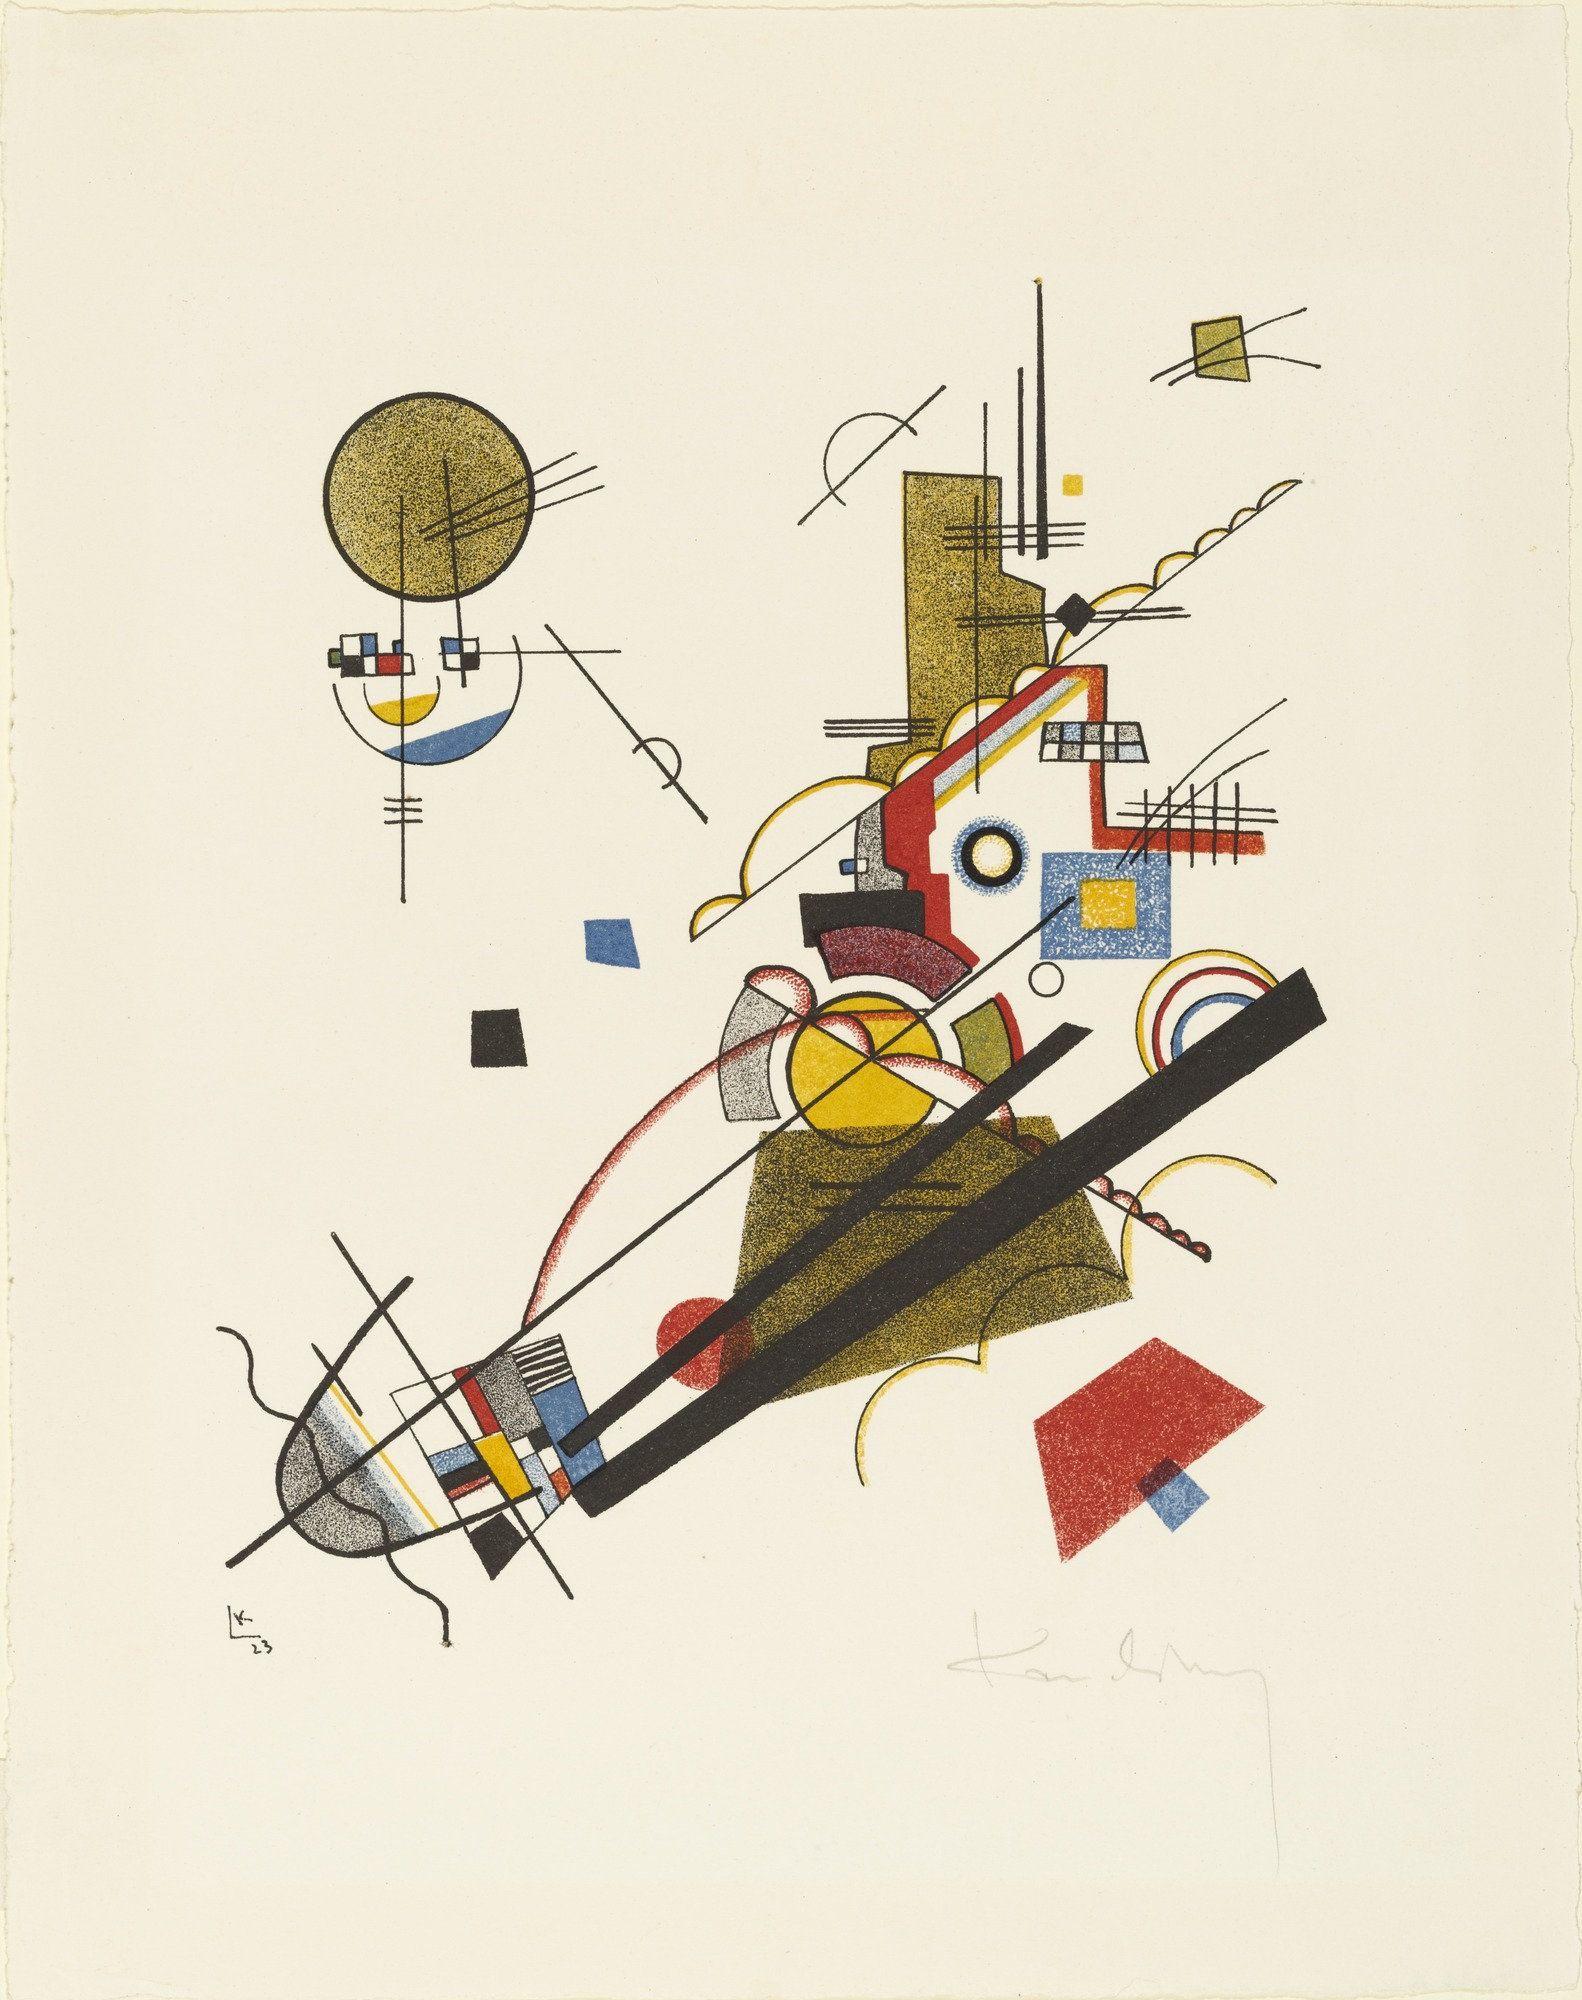 Joyous Ascent (Fröhlicher Aufstieg) from Masters' Portfolio of the Staatliches Bauhaus (Meistermappe des Staatlichen Bauhauses), Vasily Kandinsky, 1923. (From MoMA - http://www.moma.org/collection/works/74408?locale=en)